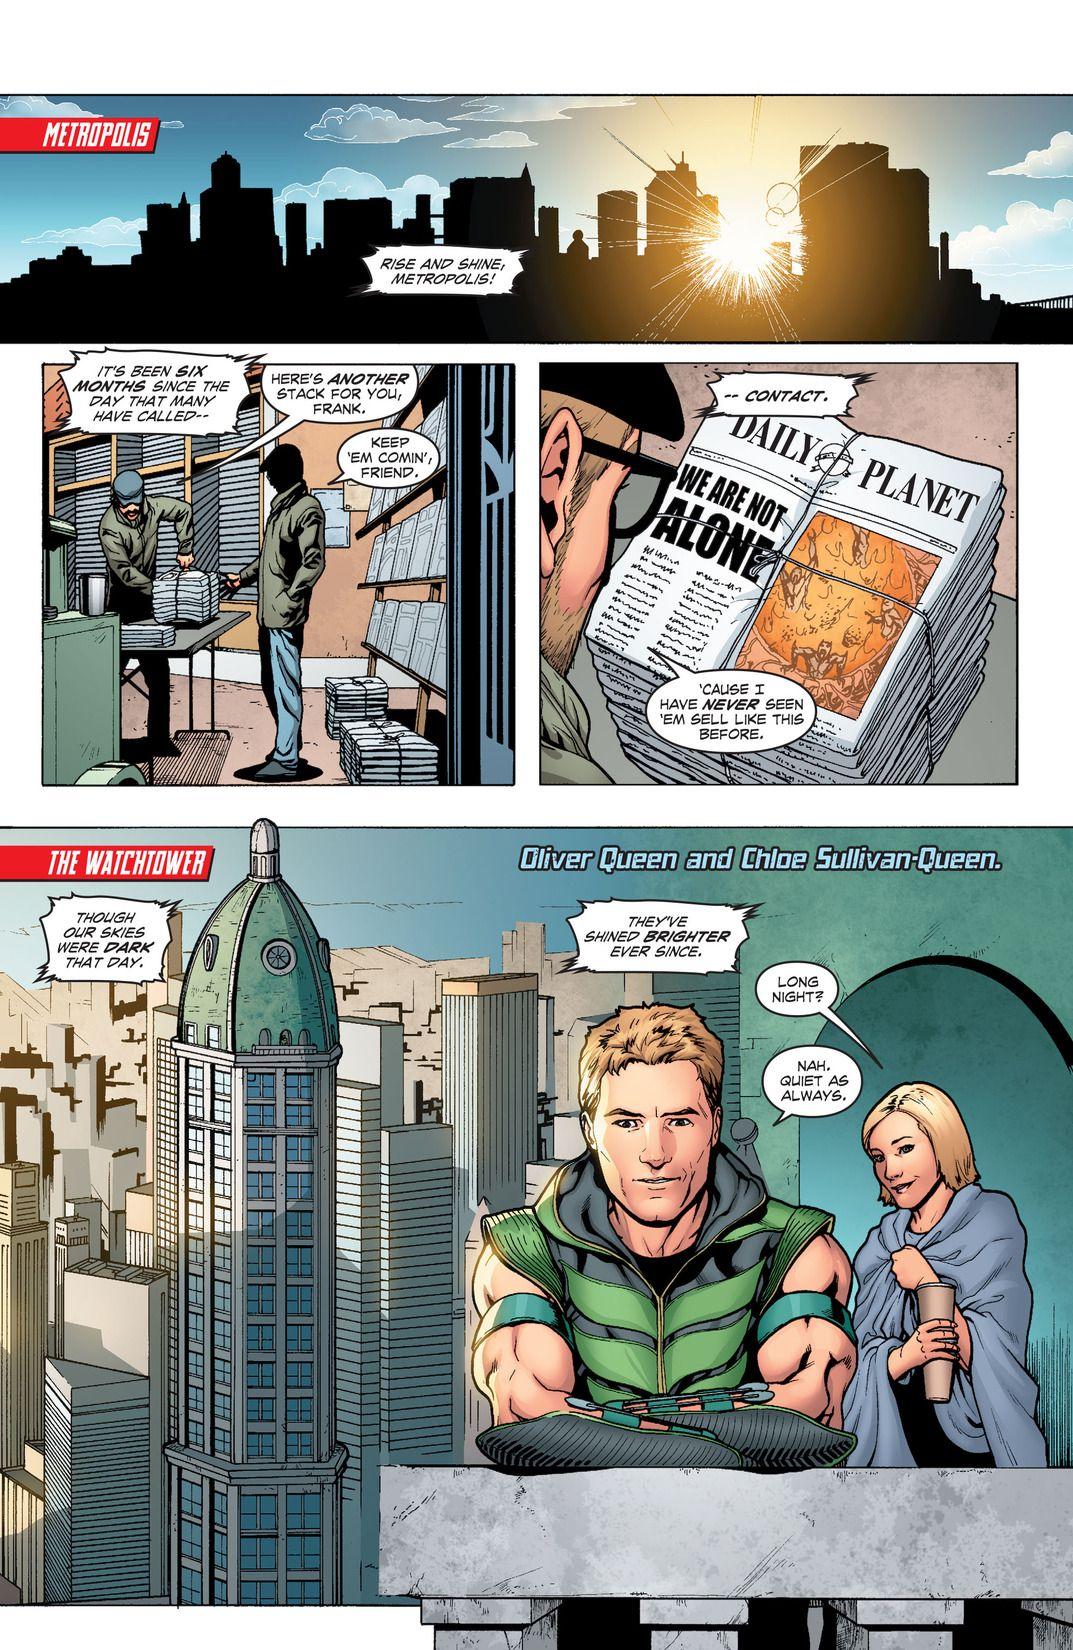 Smallville trailer season 11 / Neutral milk hotel poster uk